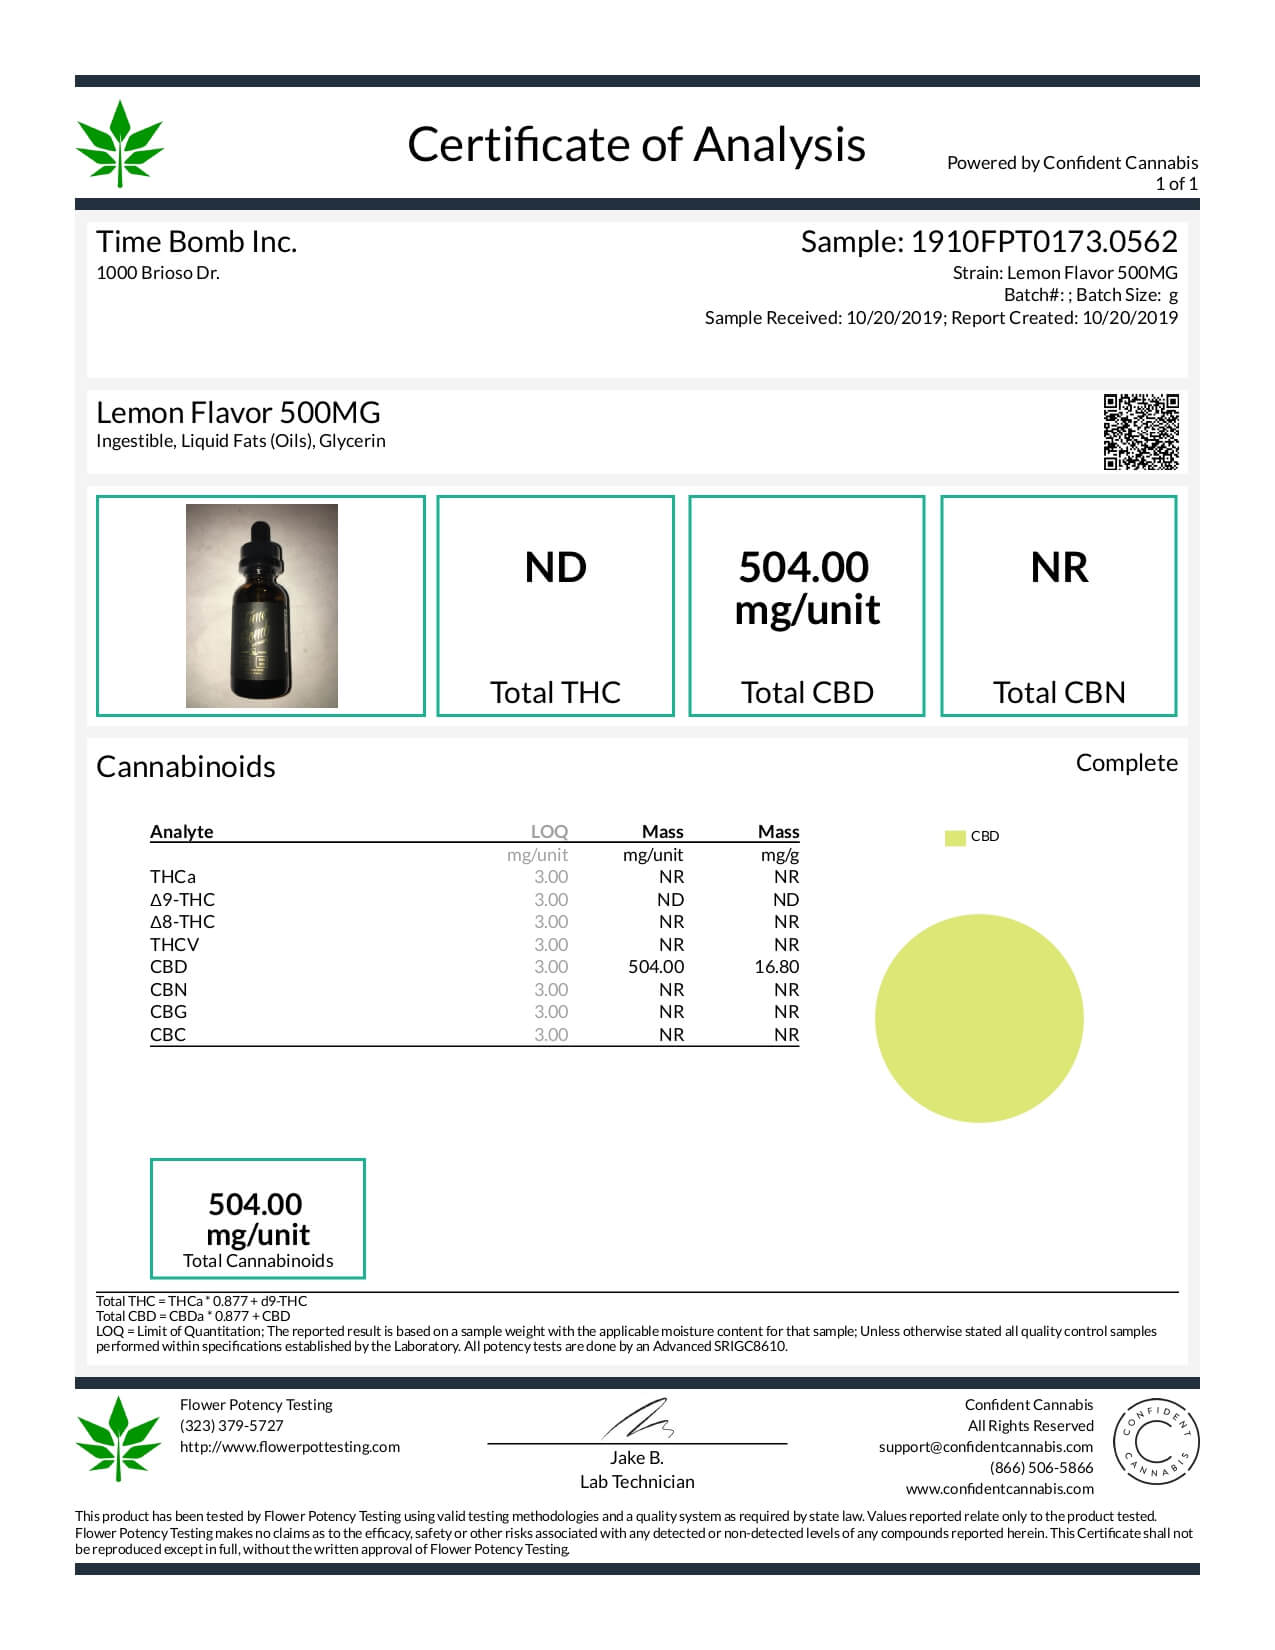 Time Bomb Extracts CBD Tincture Lemon 500mg Lab Report